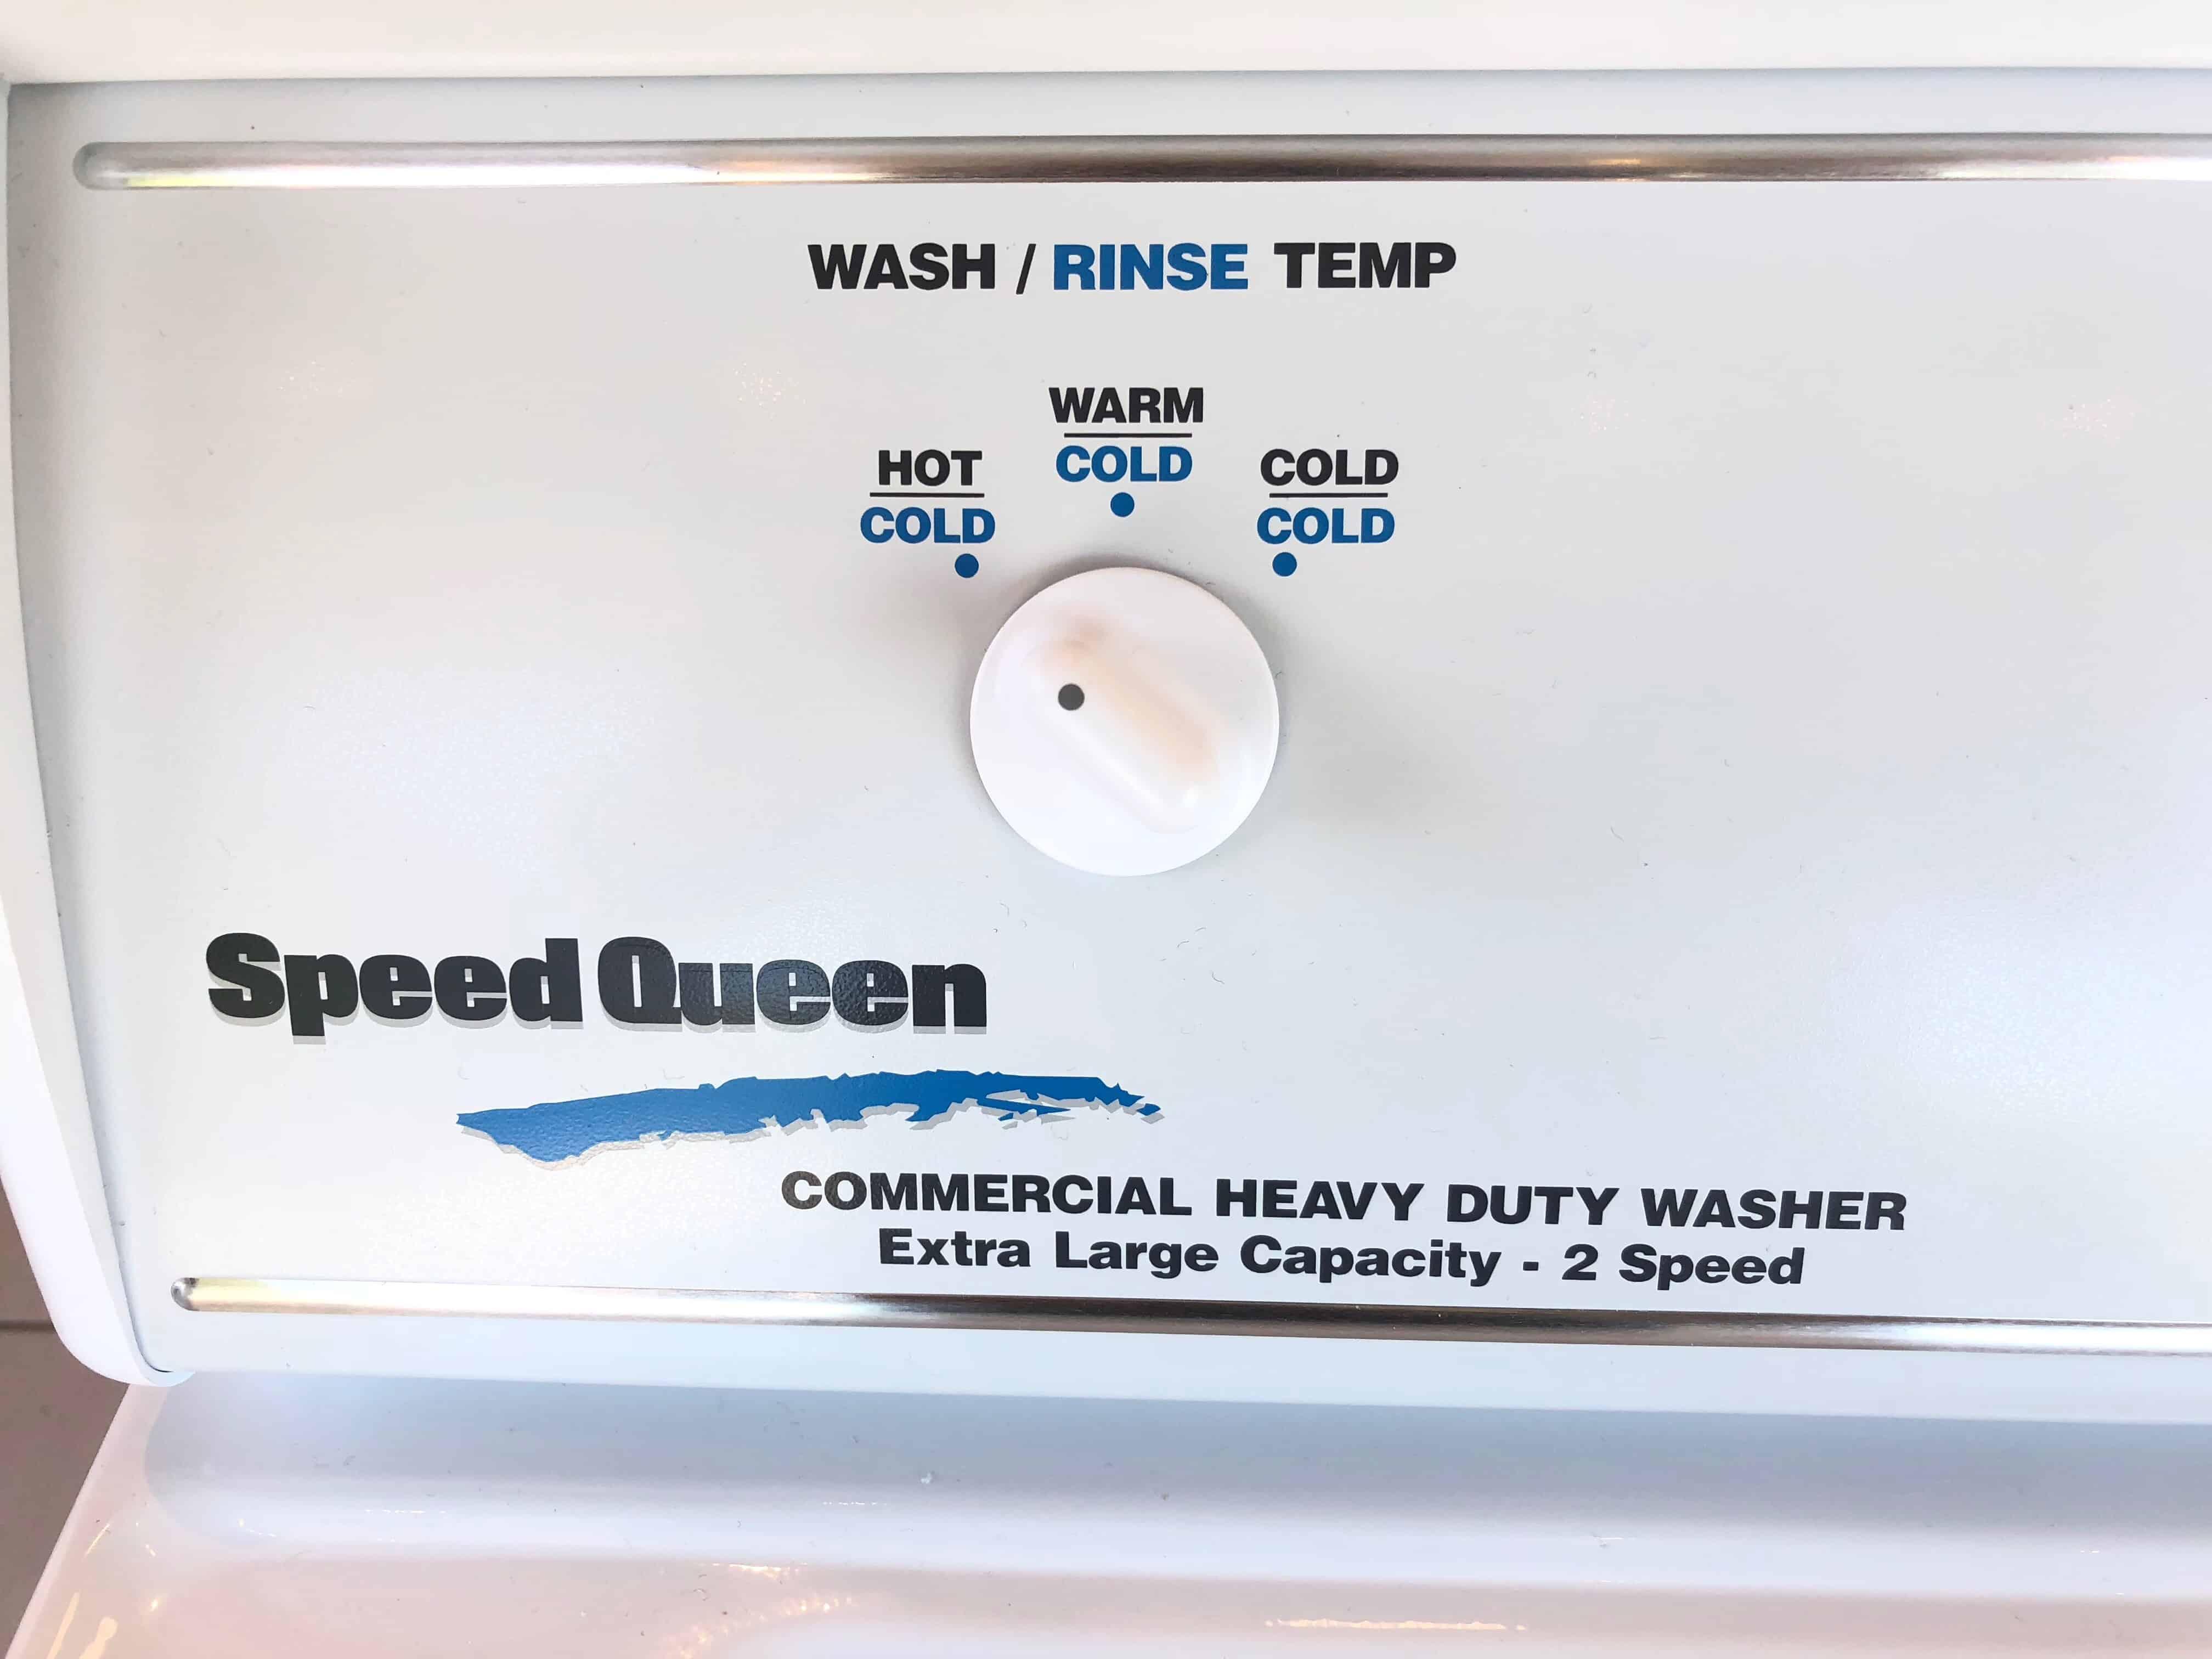 Laveuse / Sécheuse | Speed Queen